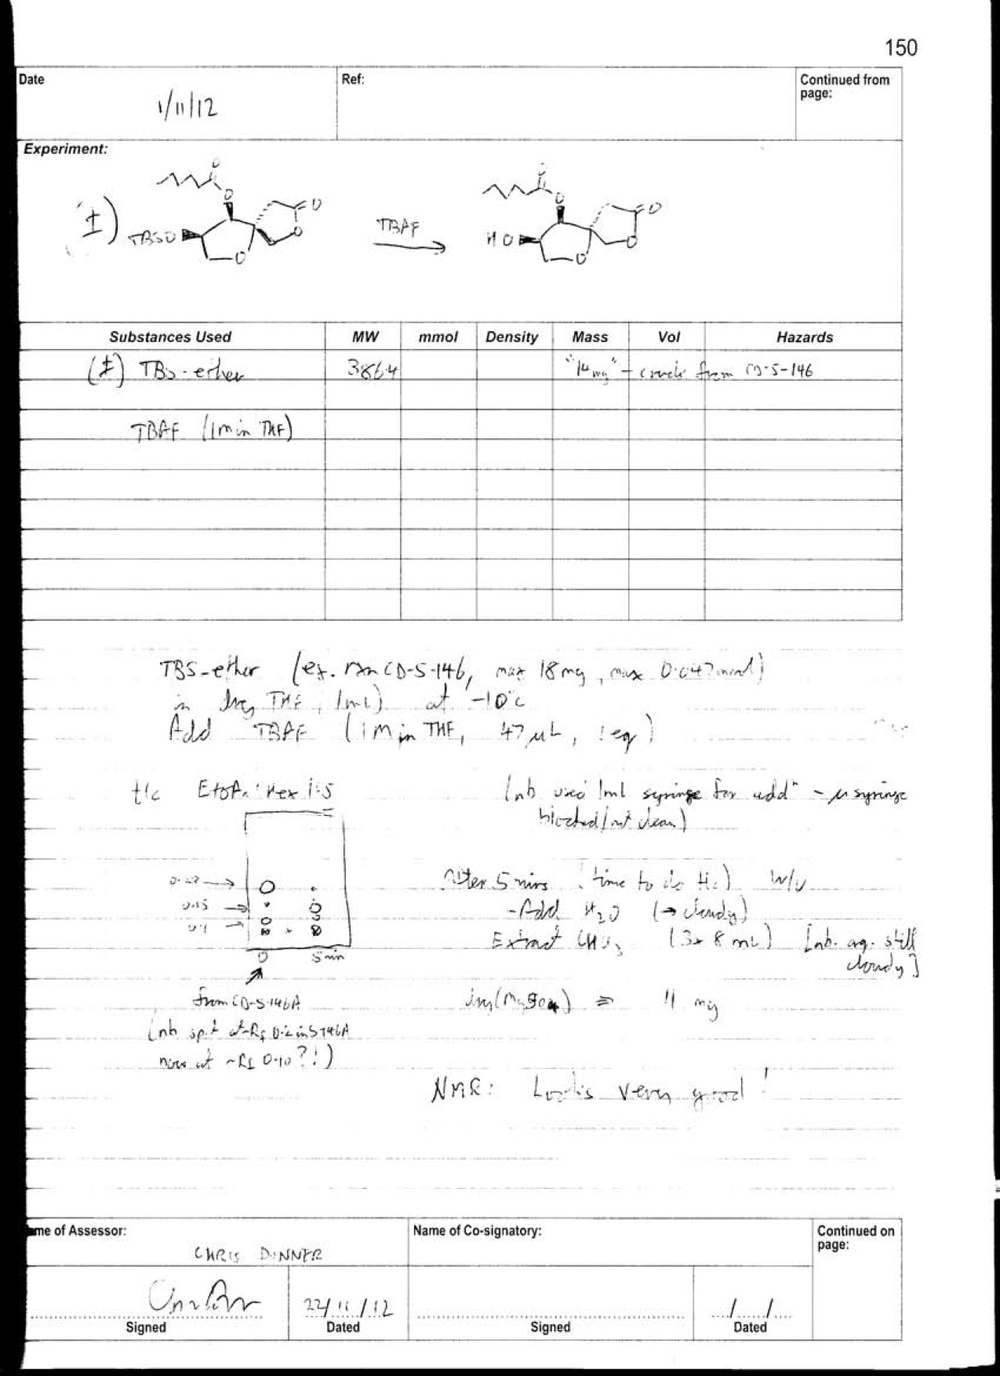 4-epi-secosyrin Labbook 1